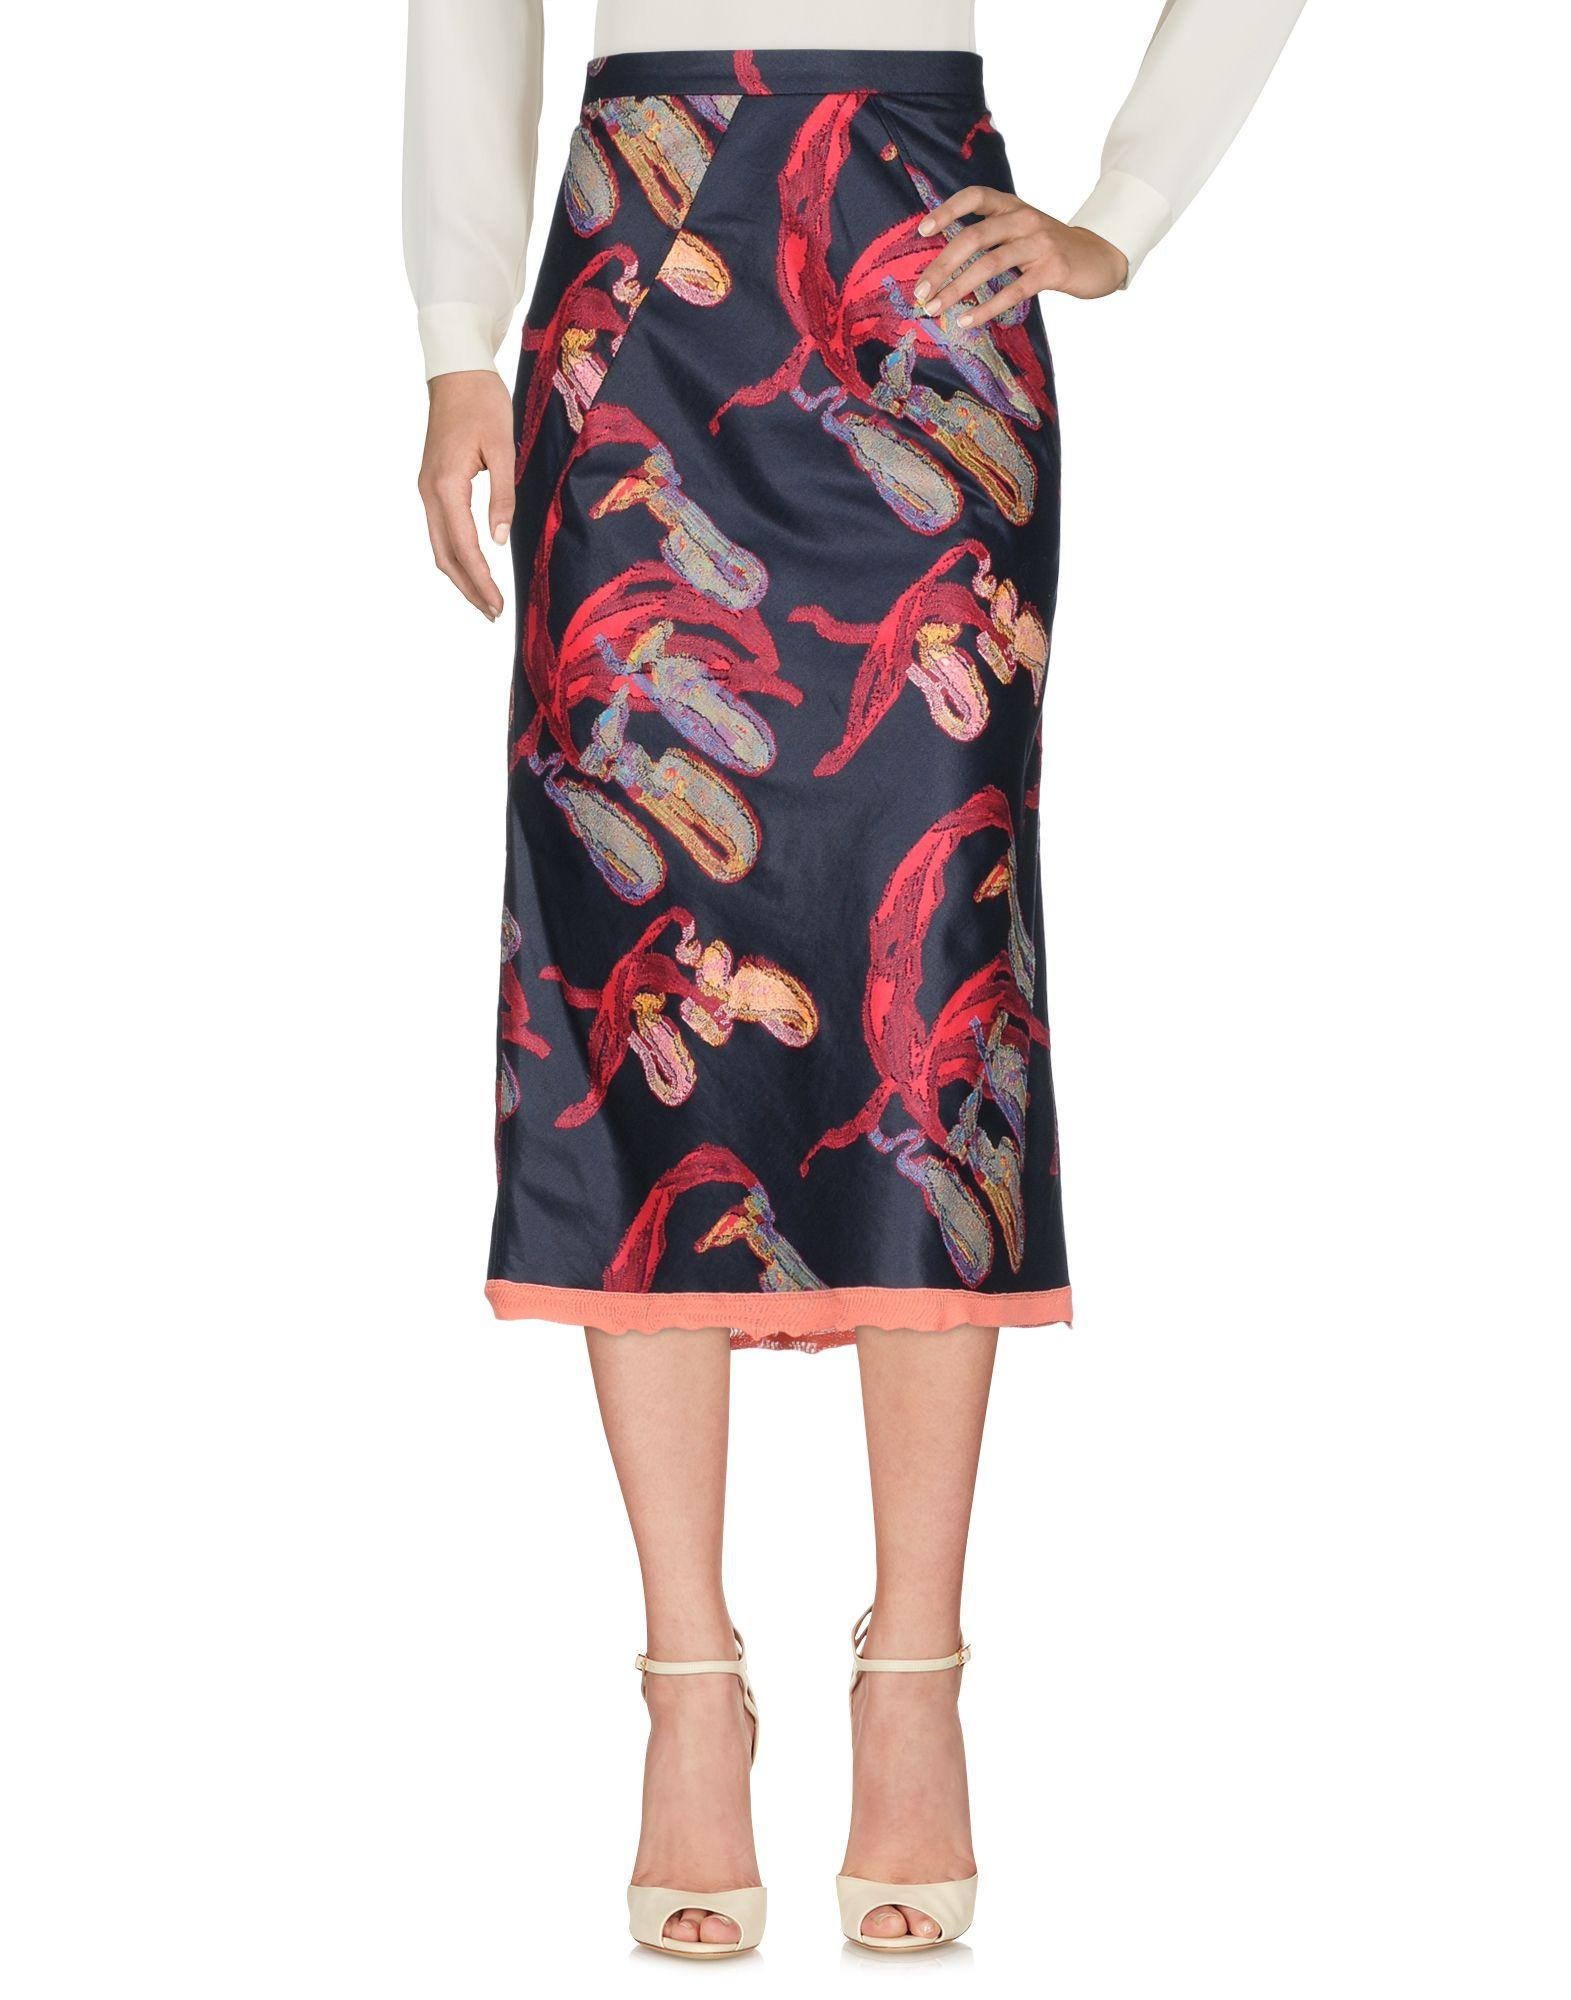 Sonia Rykiel 3/4 Length Skirt In Dark Blue